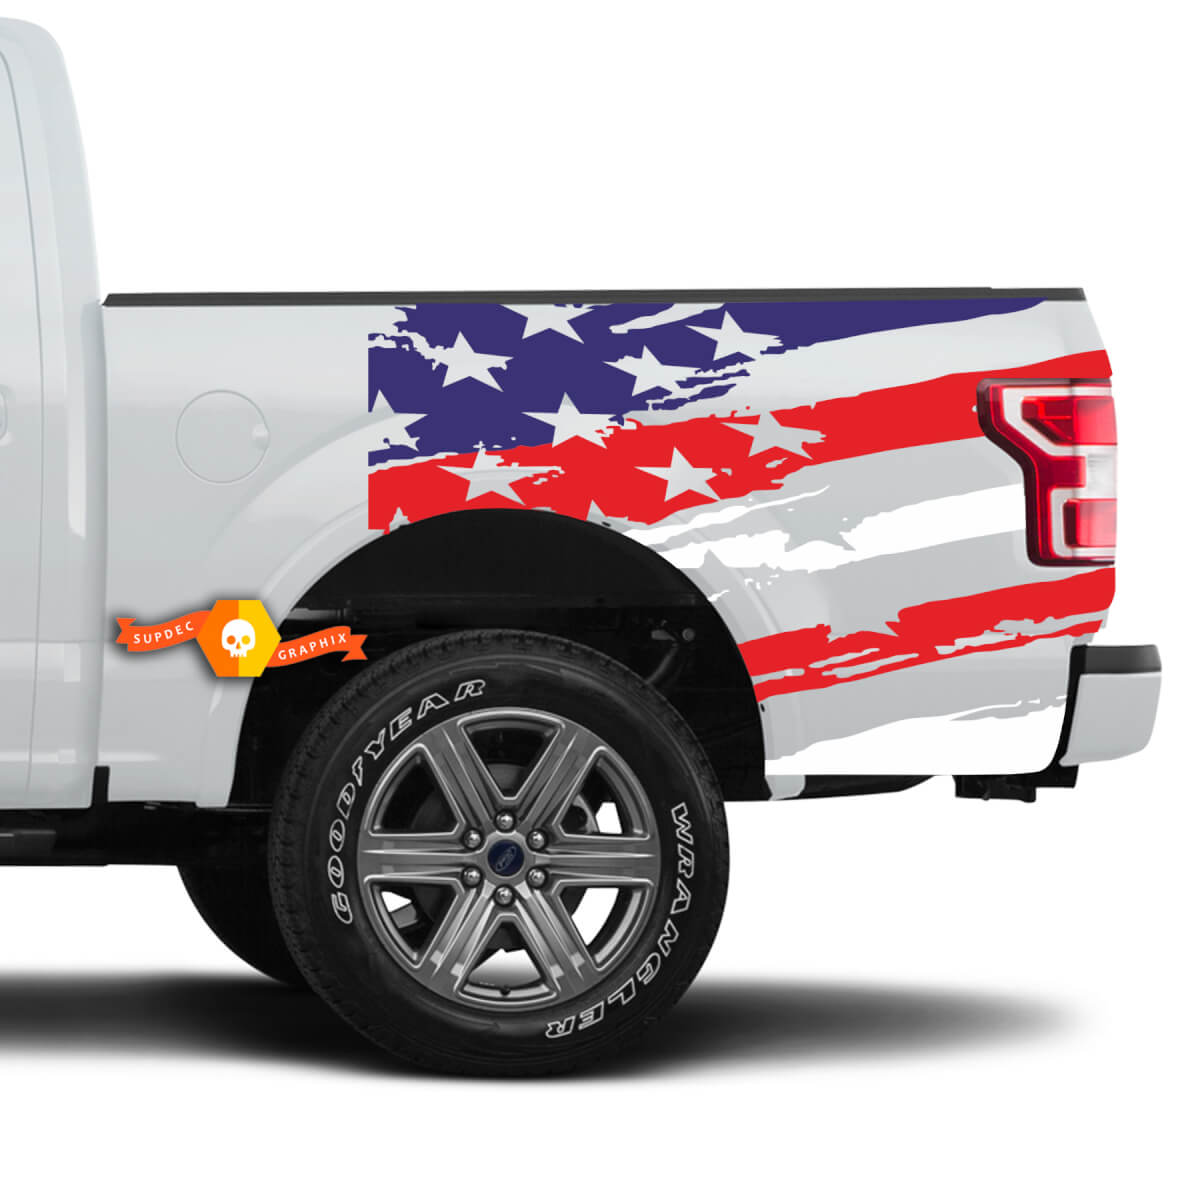 LKW-Ladefläche US-Flagge FARBEN Vinyl Aufkleber